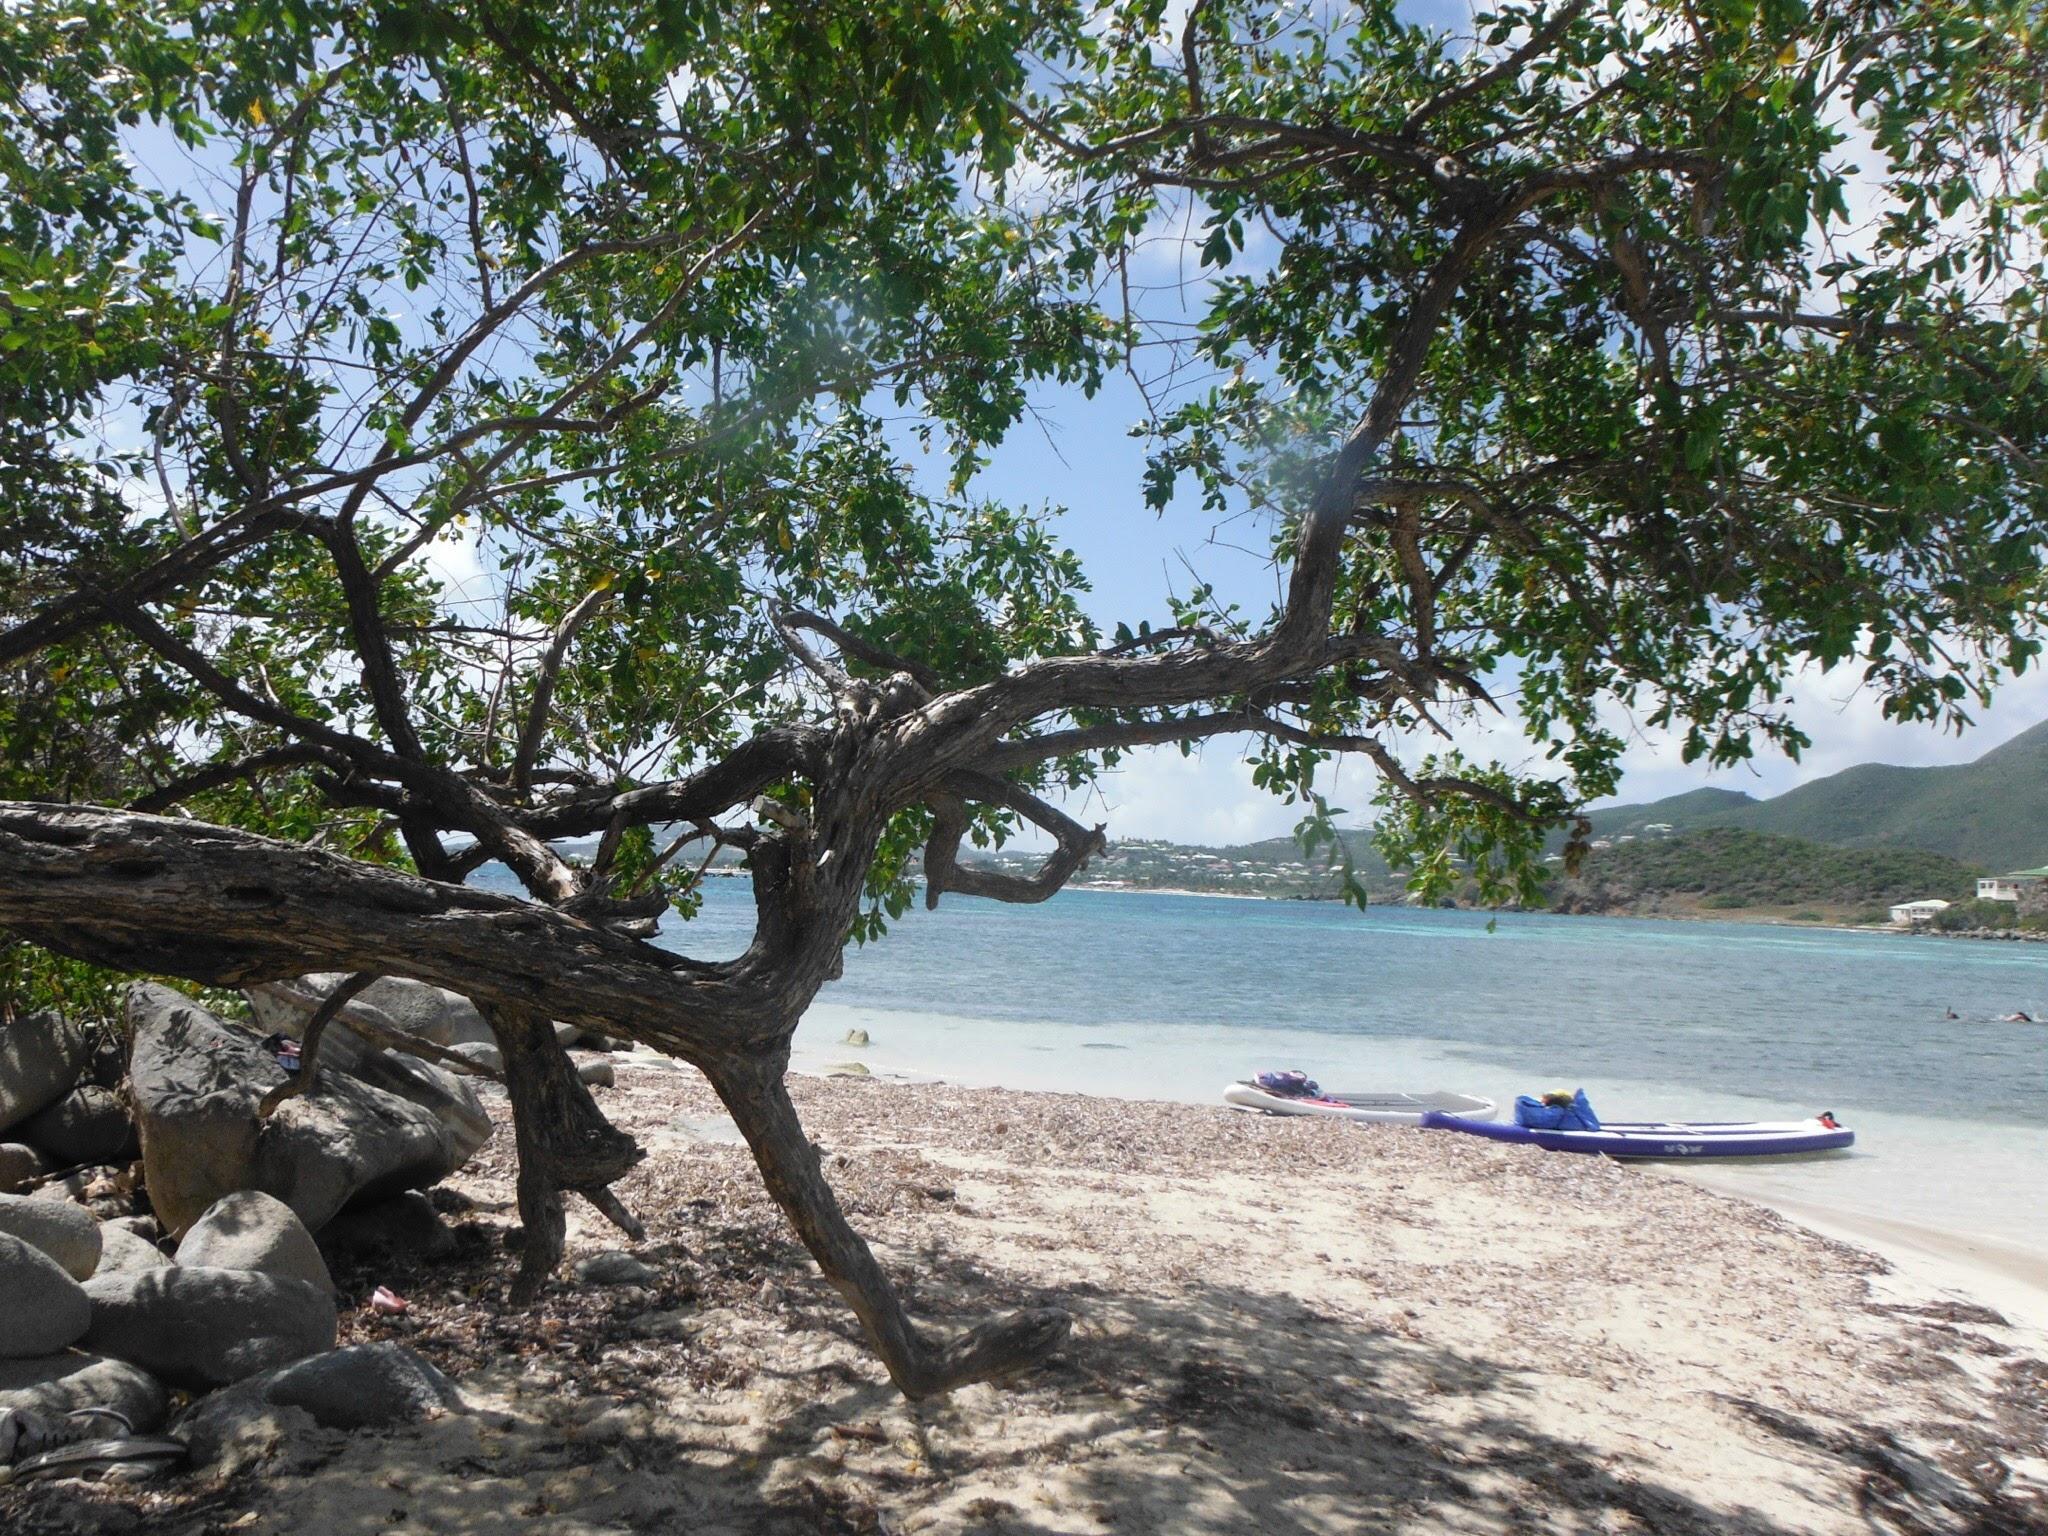 Beach - St. Martin - 55 by 55 Travel